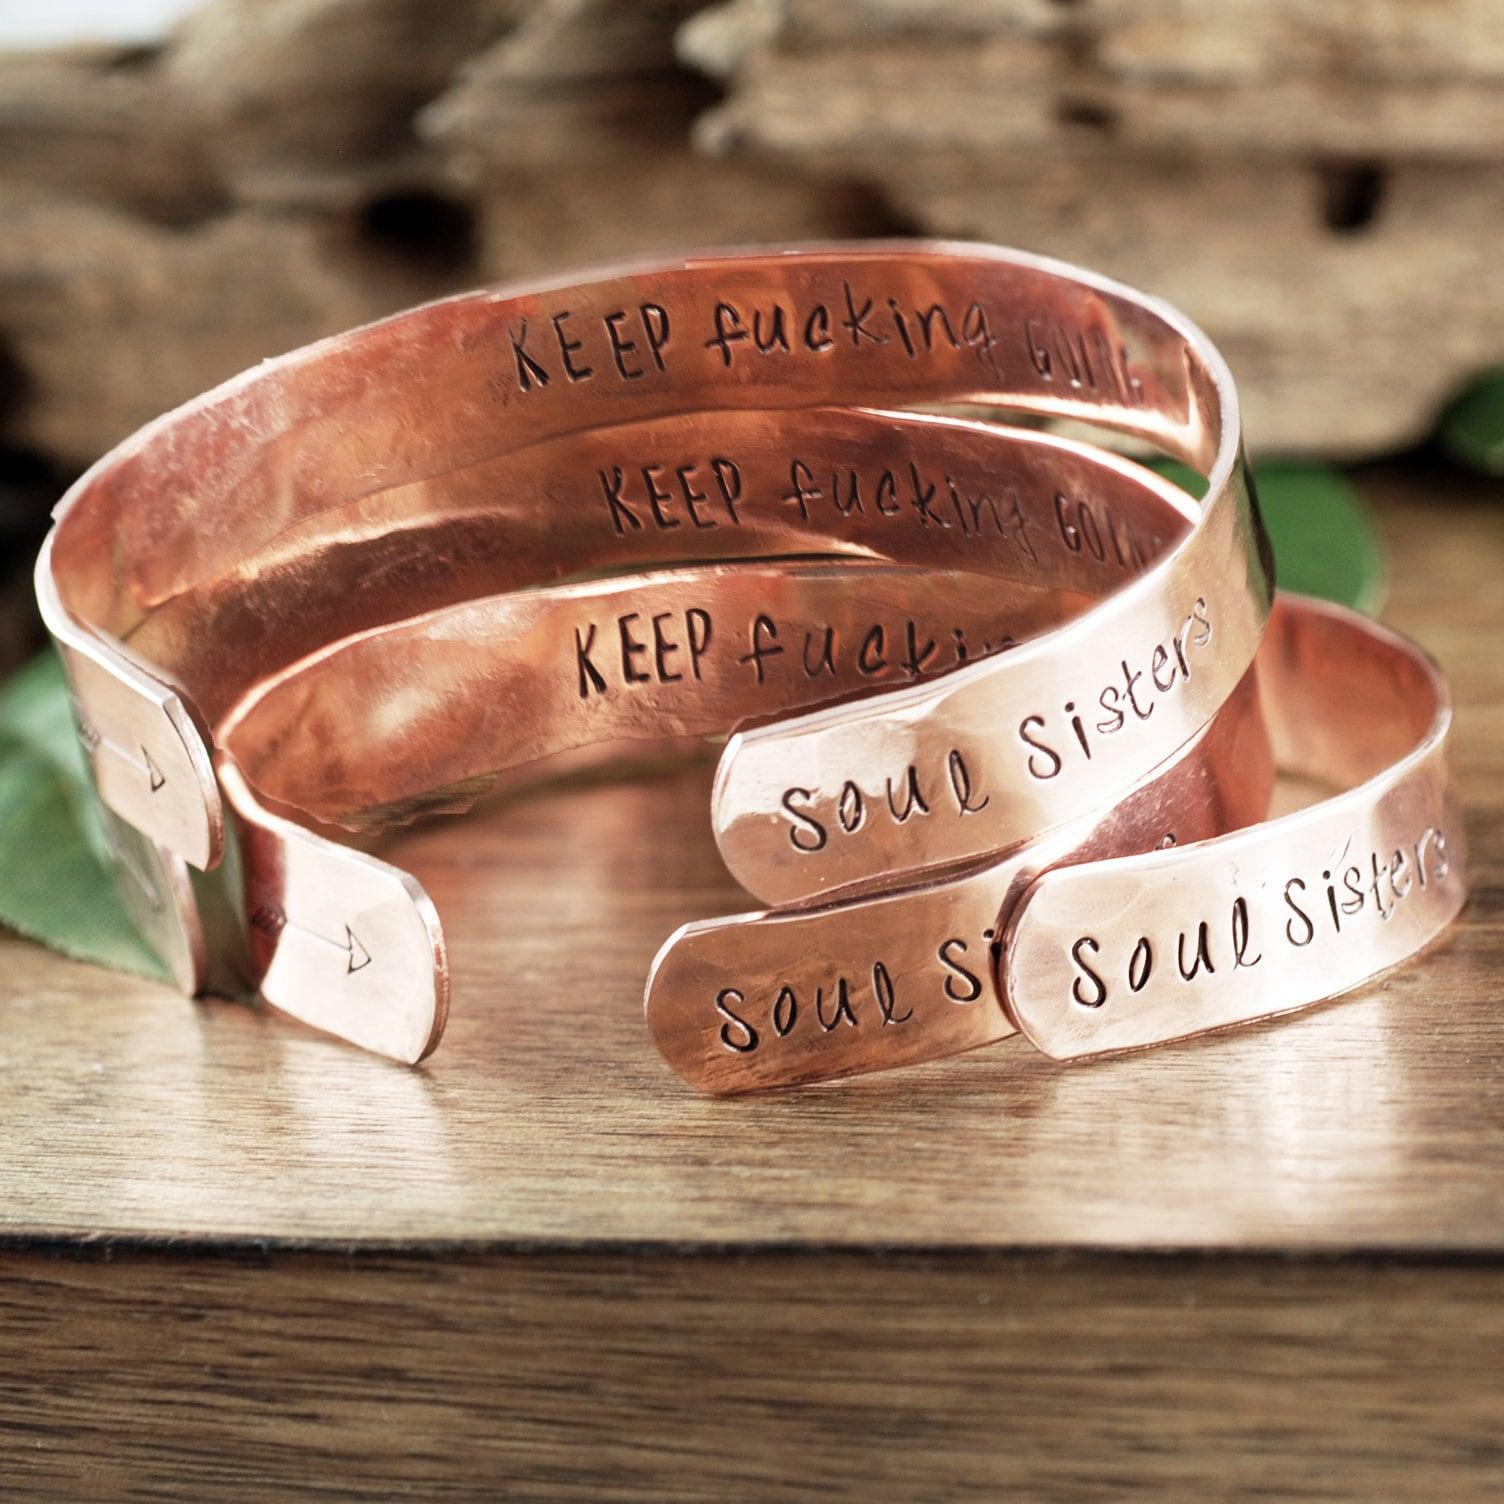 b15d842637a41 Soul Sisters Bracelet, Keep Fucking Going Bracelet, Keep Going ...